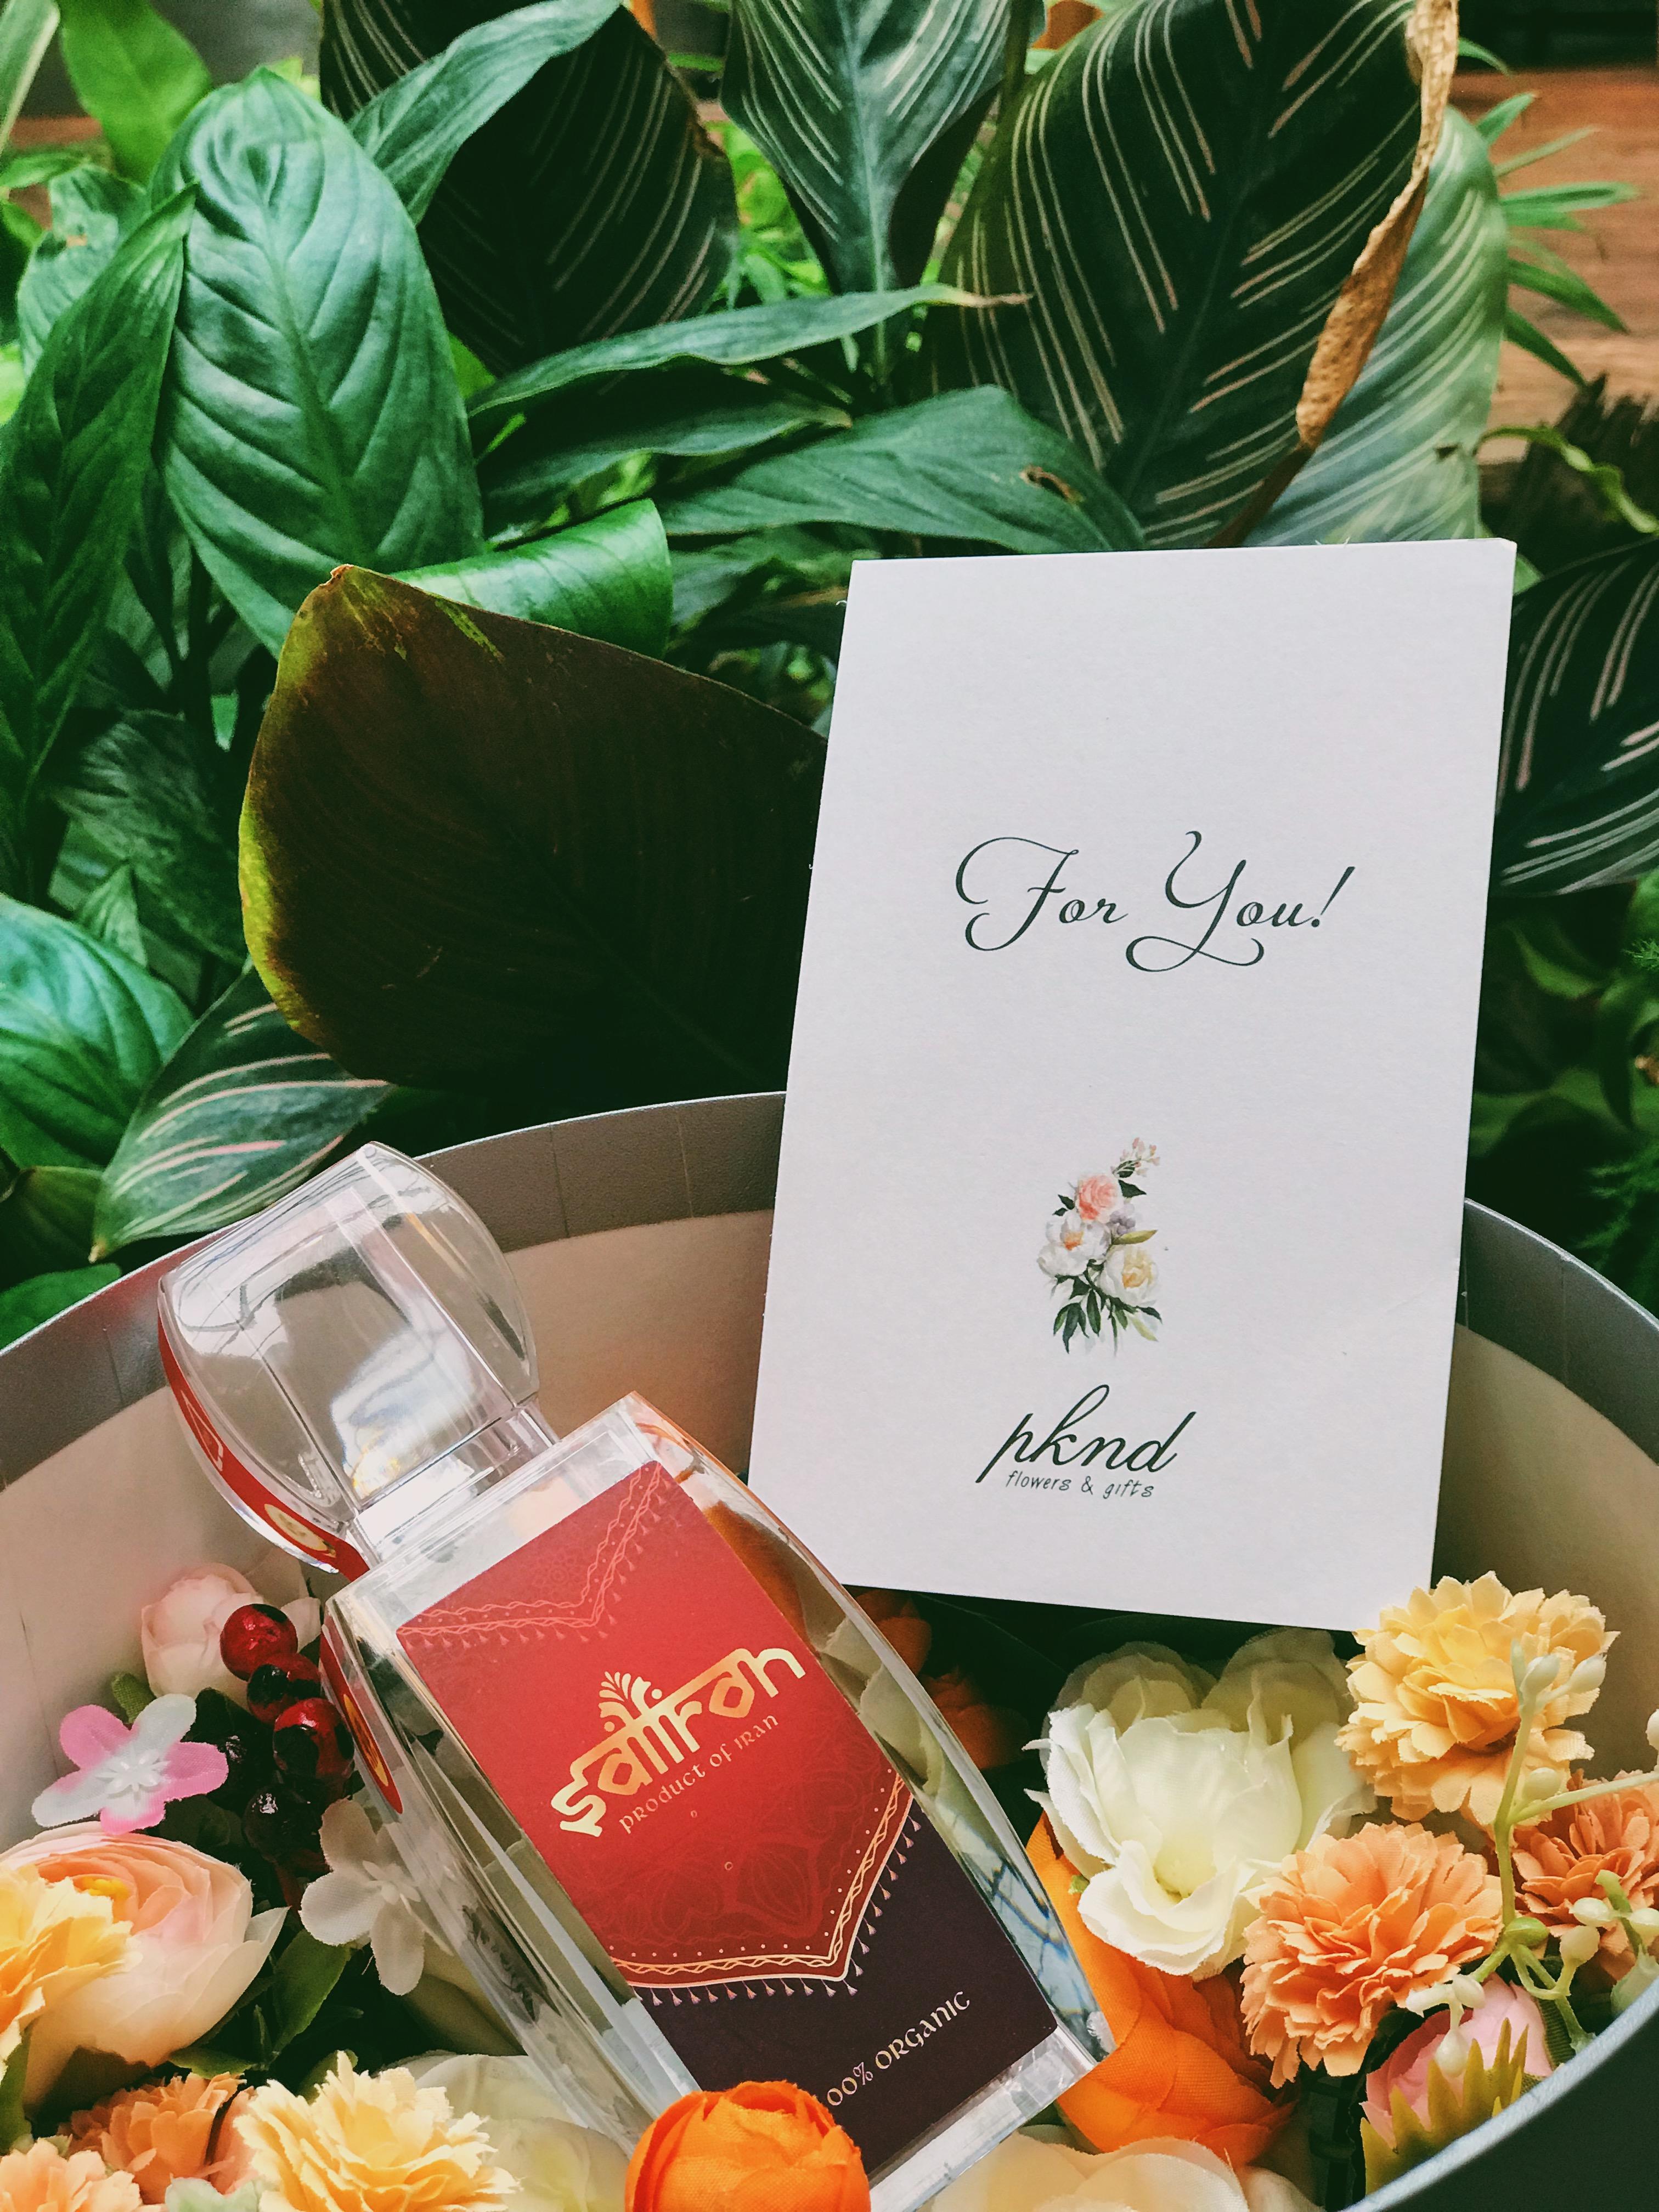 Nhụy Hoa Nghệ Tây Saffron SALAM 3Gr/hộp tặng kèm 1 hộp Saffron Salam 1Gram